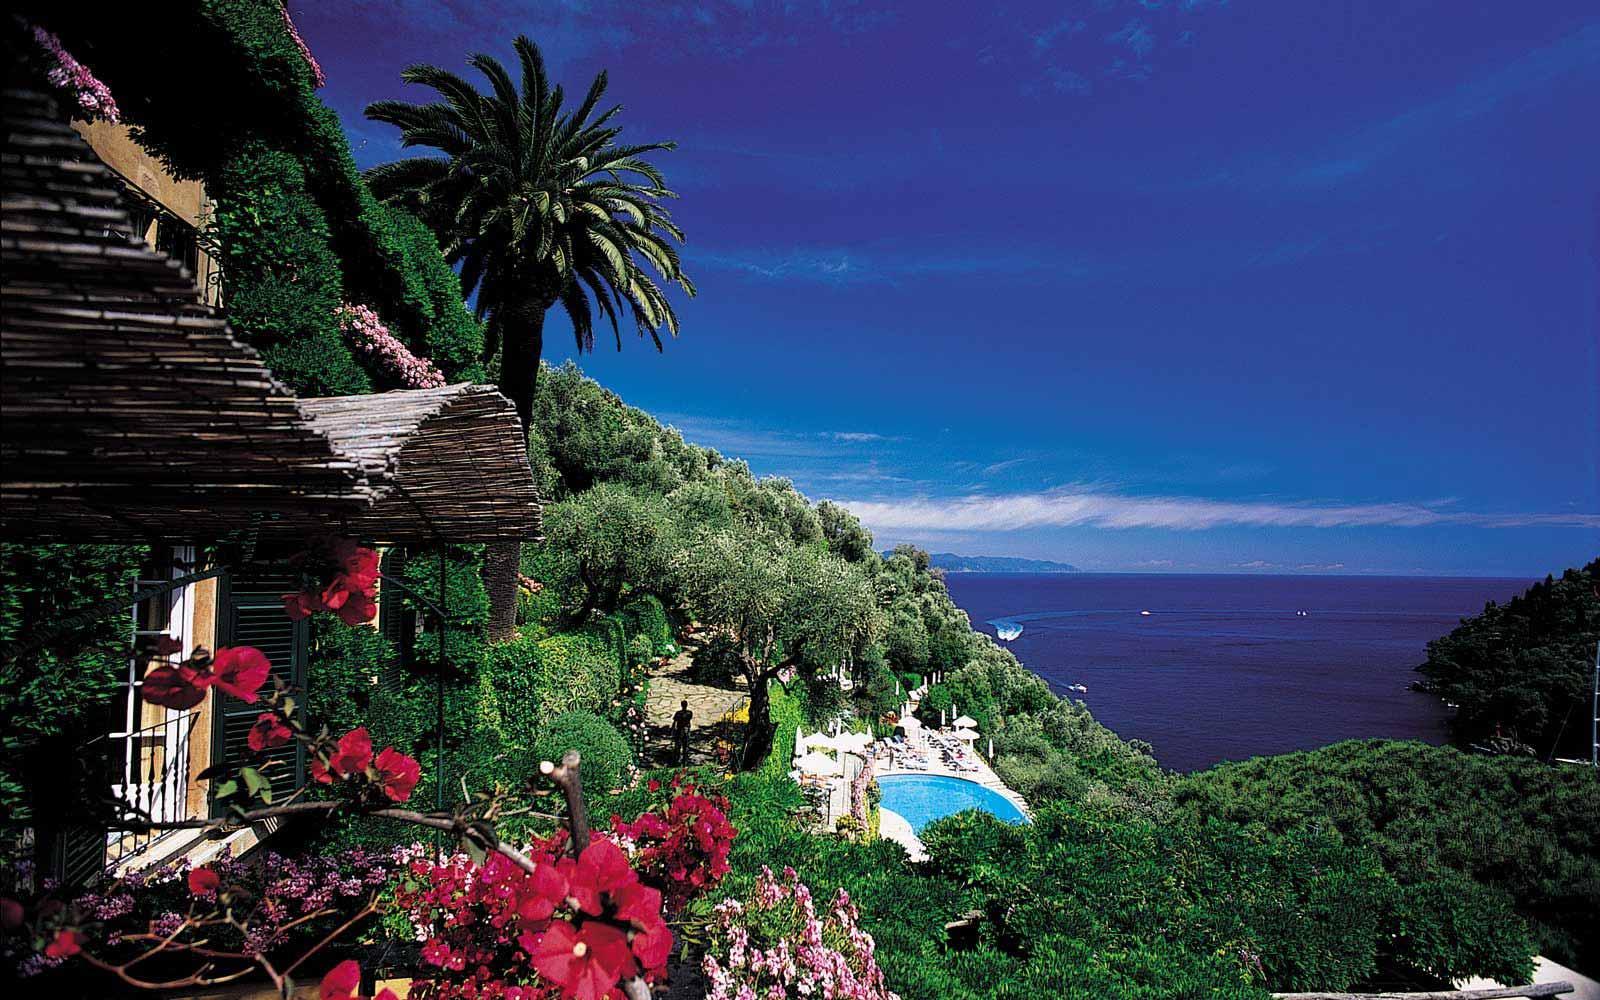 Views from Belmond Hotel Splendido & Splendido Mare